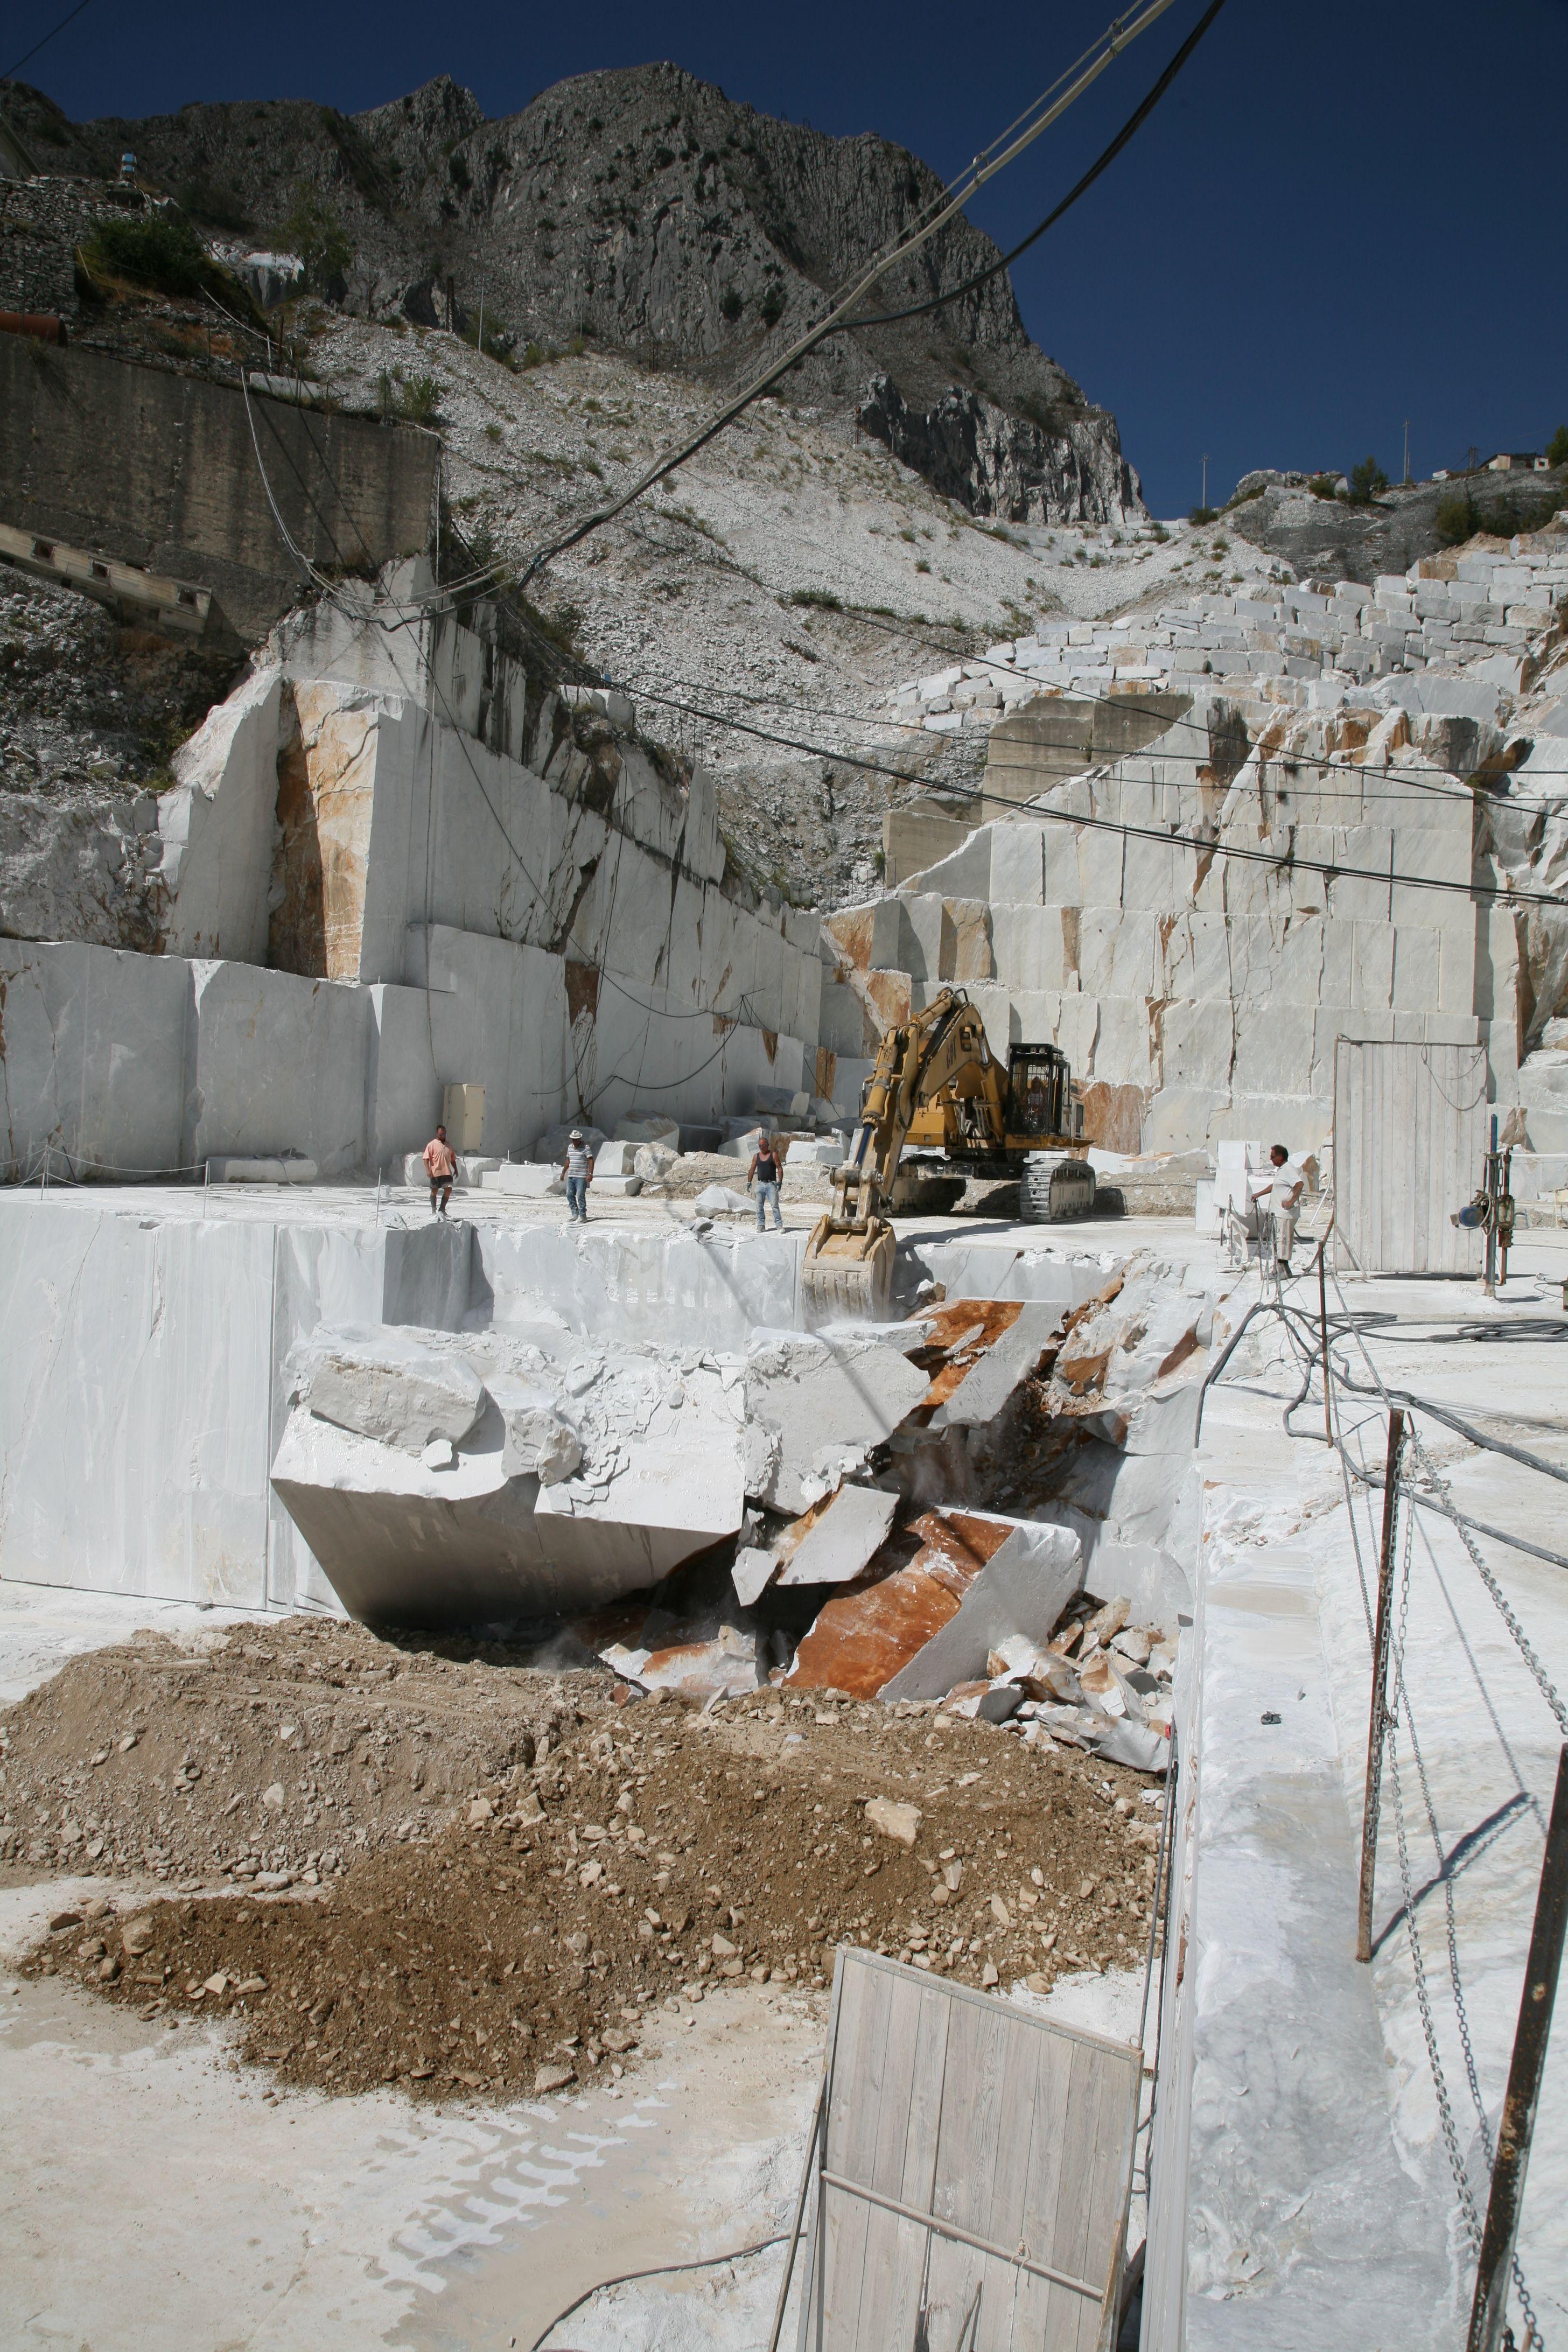 Carrara marble quarry | Amazing Carrara Quarry Photos in